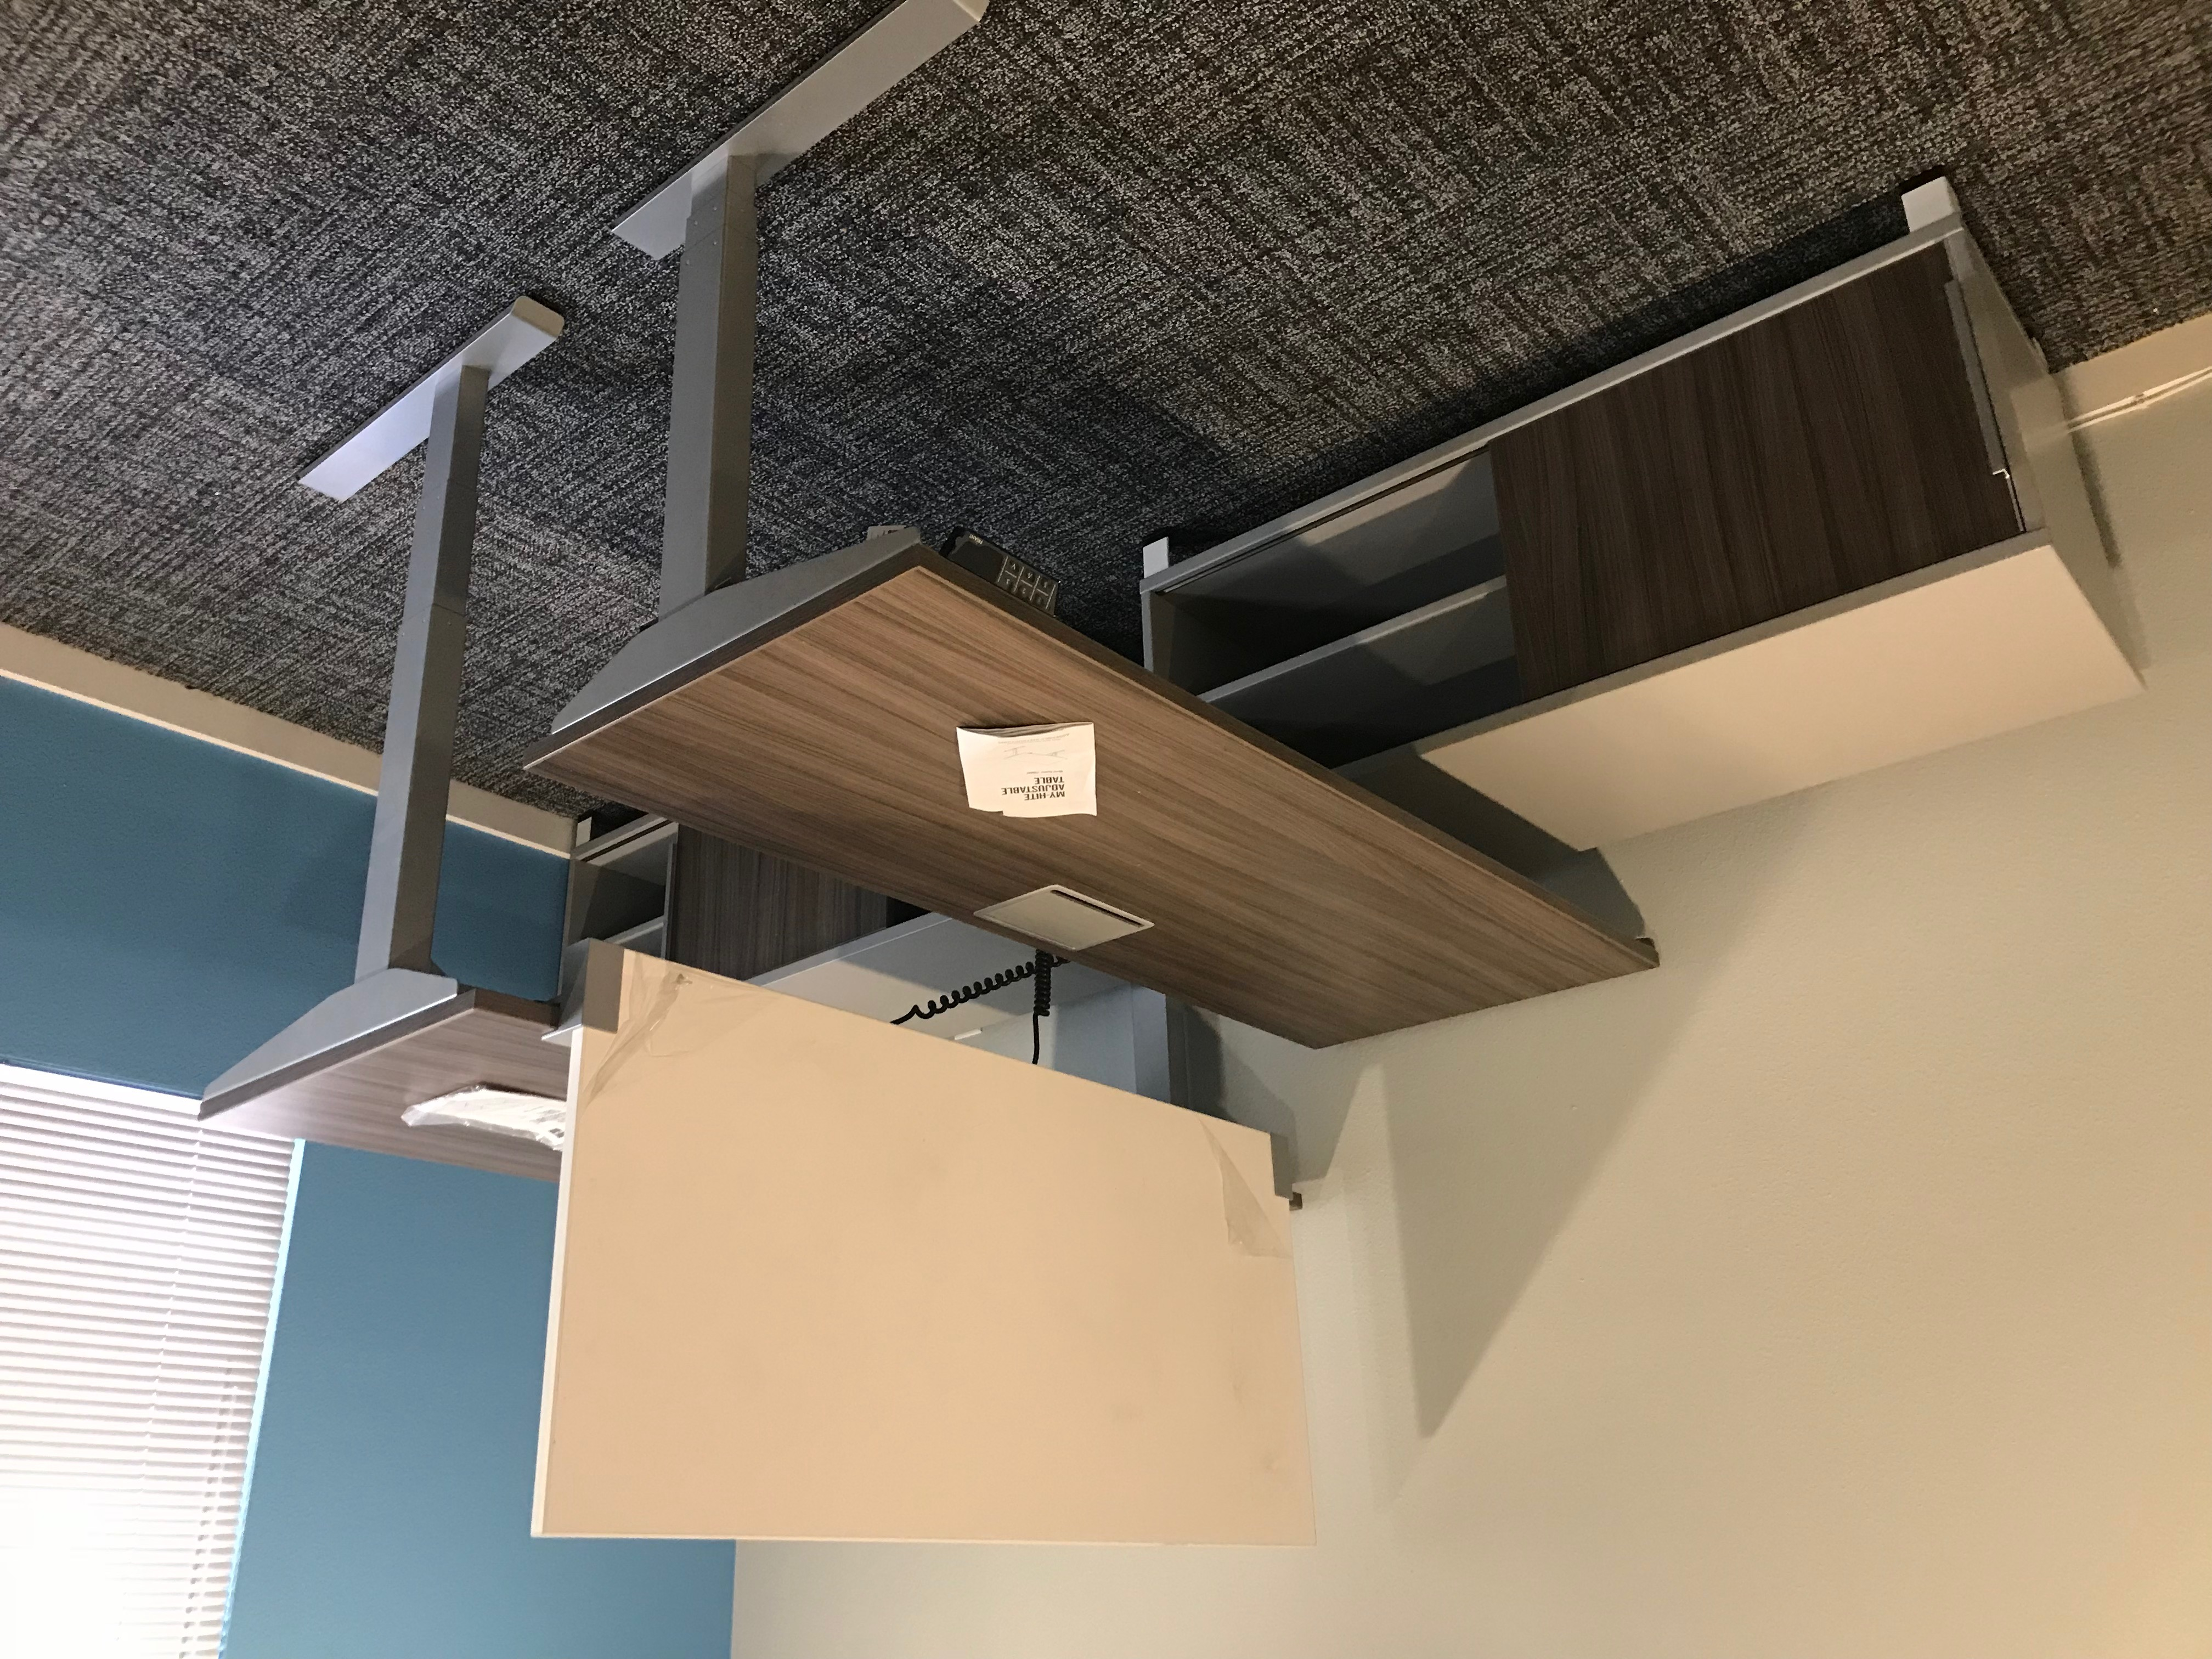 manasota-office-supplies-llc-adjustable-tables-in-bradenton-florida-manasota-office-supplies-llc-12-.jpg